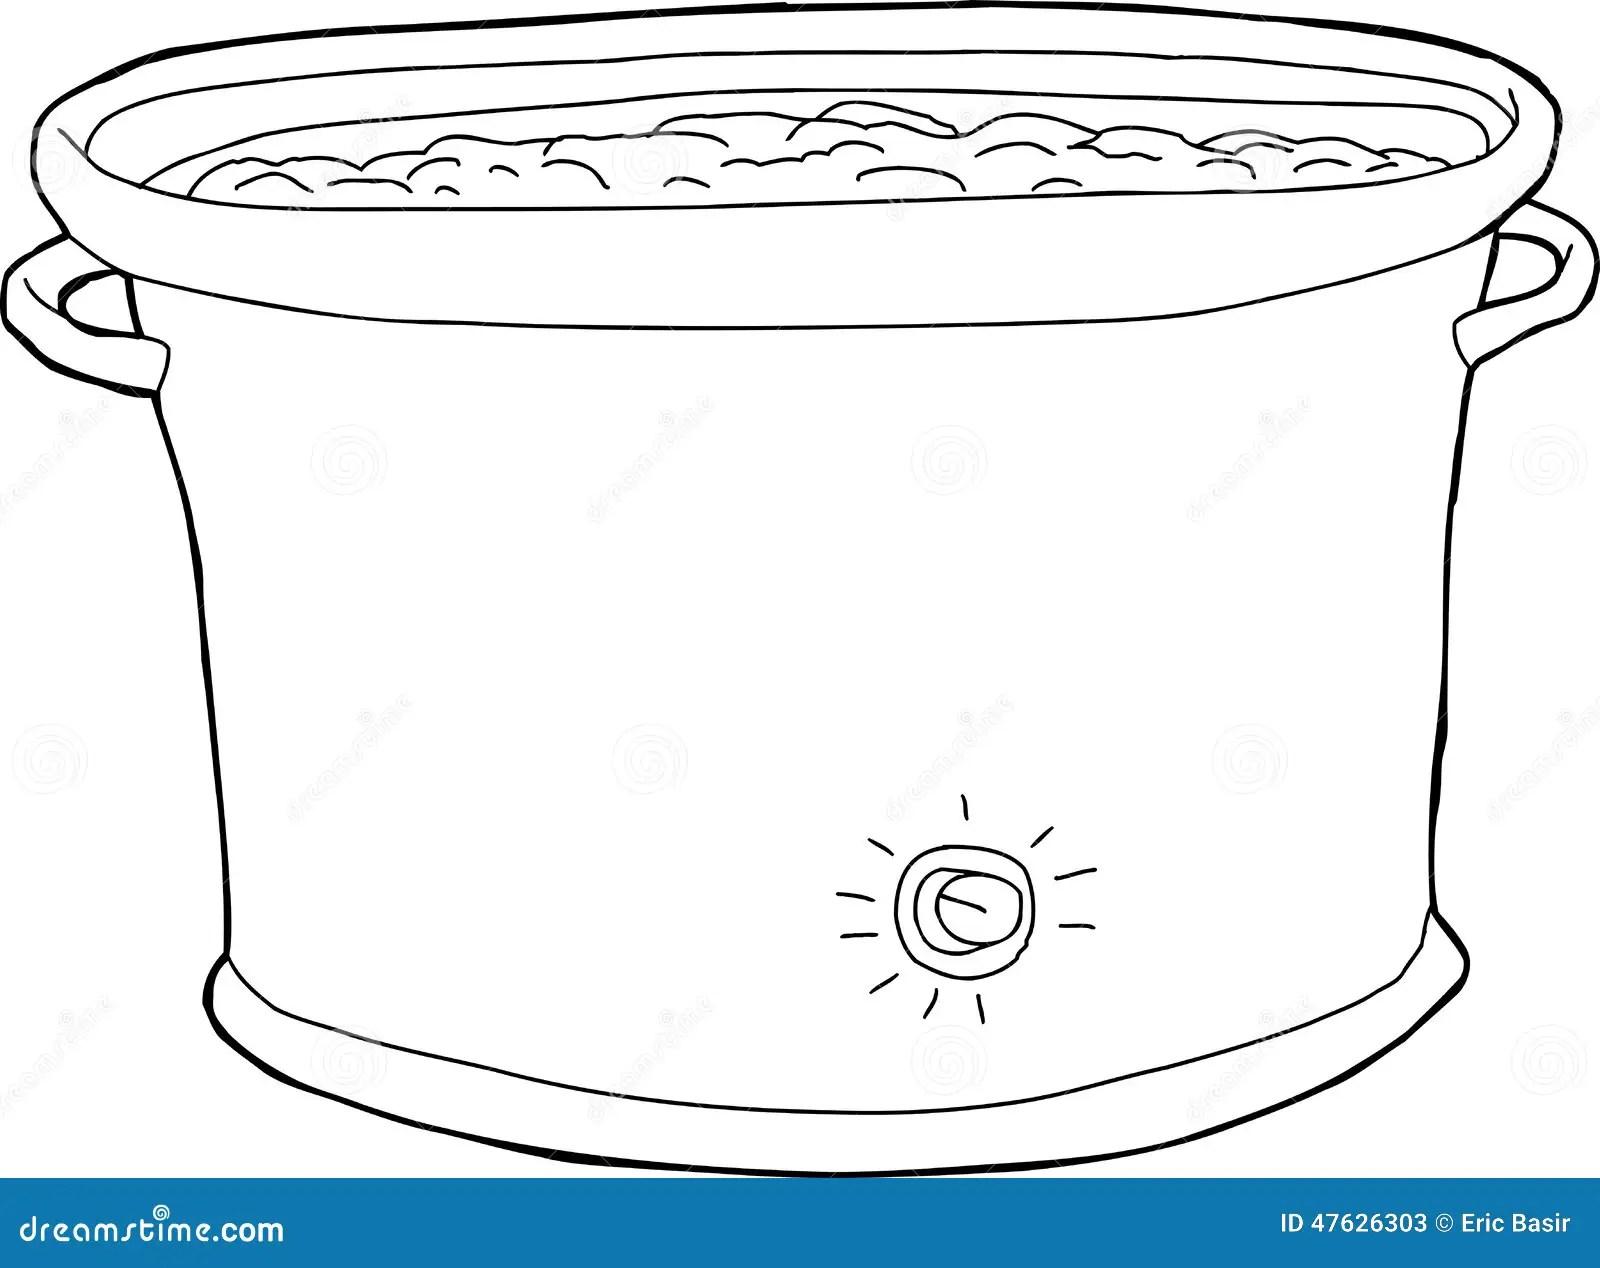 Full Crock Pot Outline stock vector. Illustration of metal